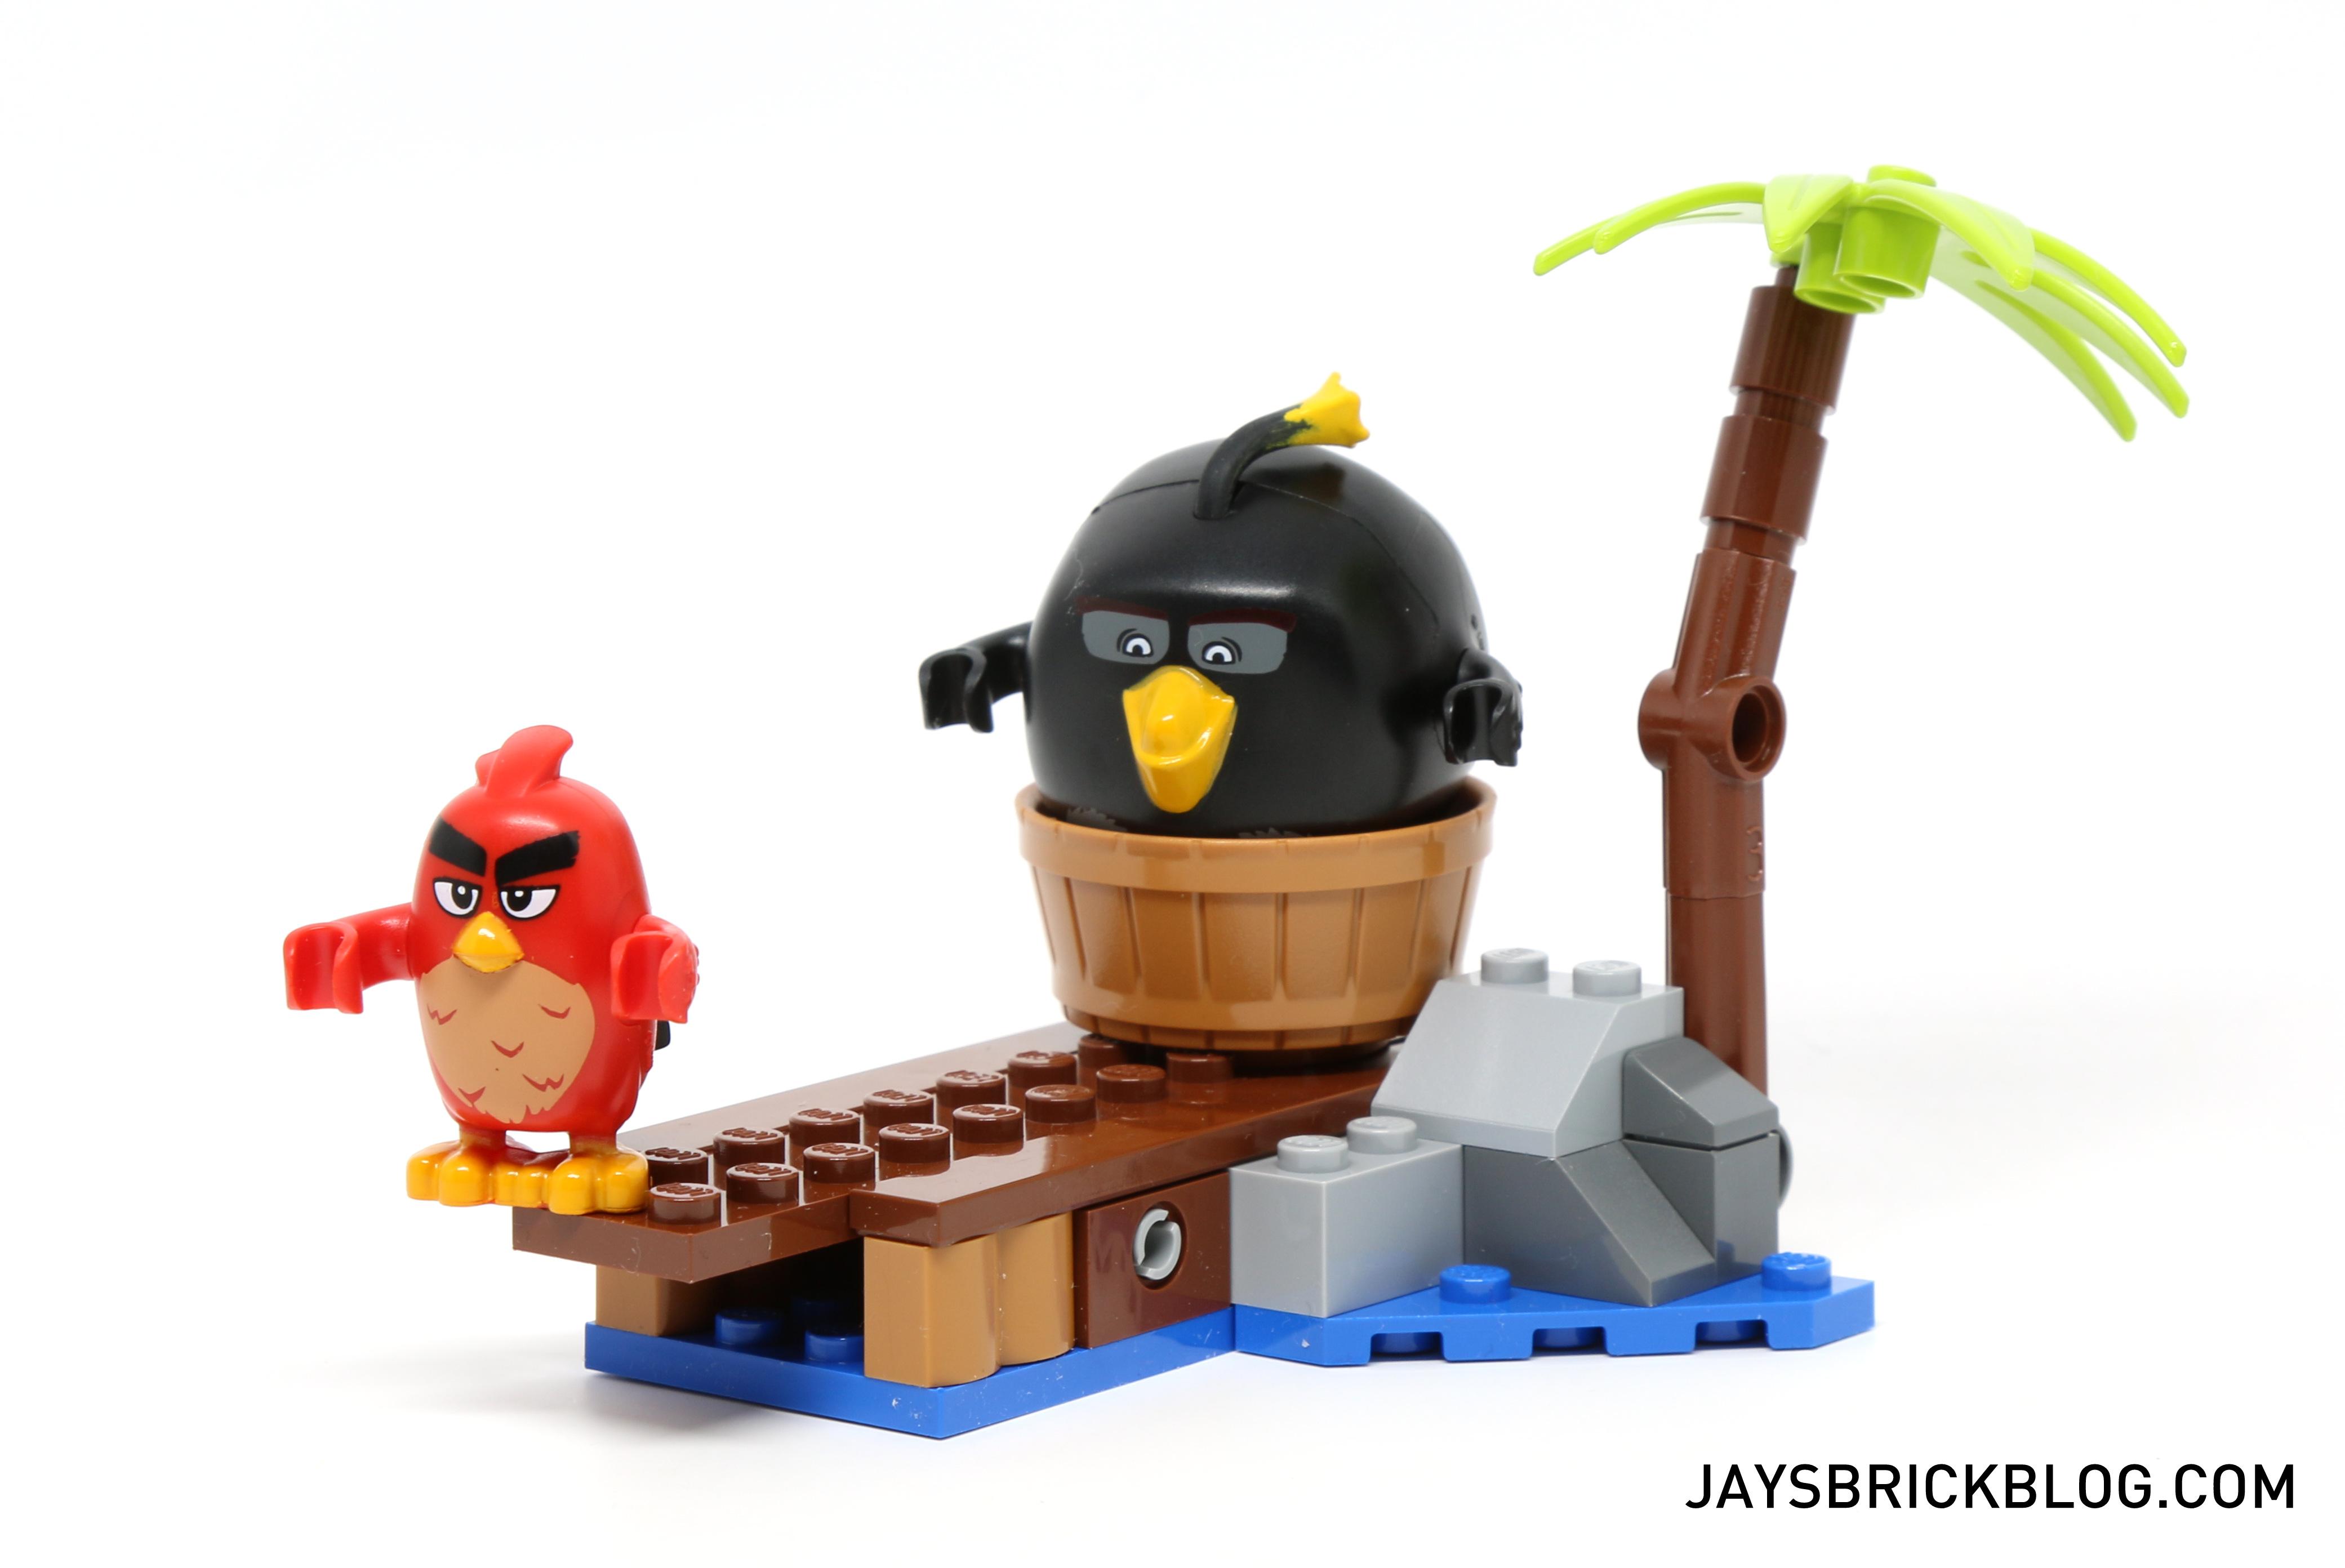 Lego New Leonard From Set 75825 Angry Birds Movie Figure